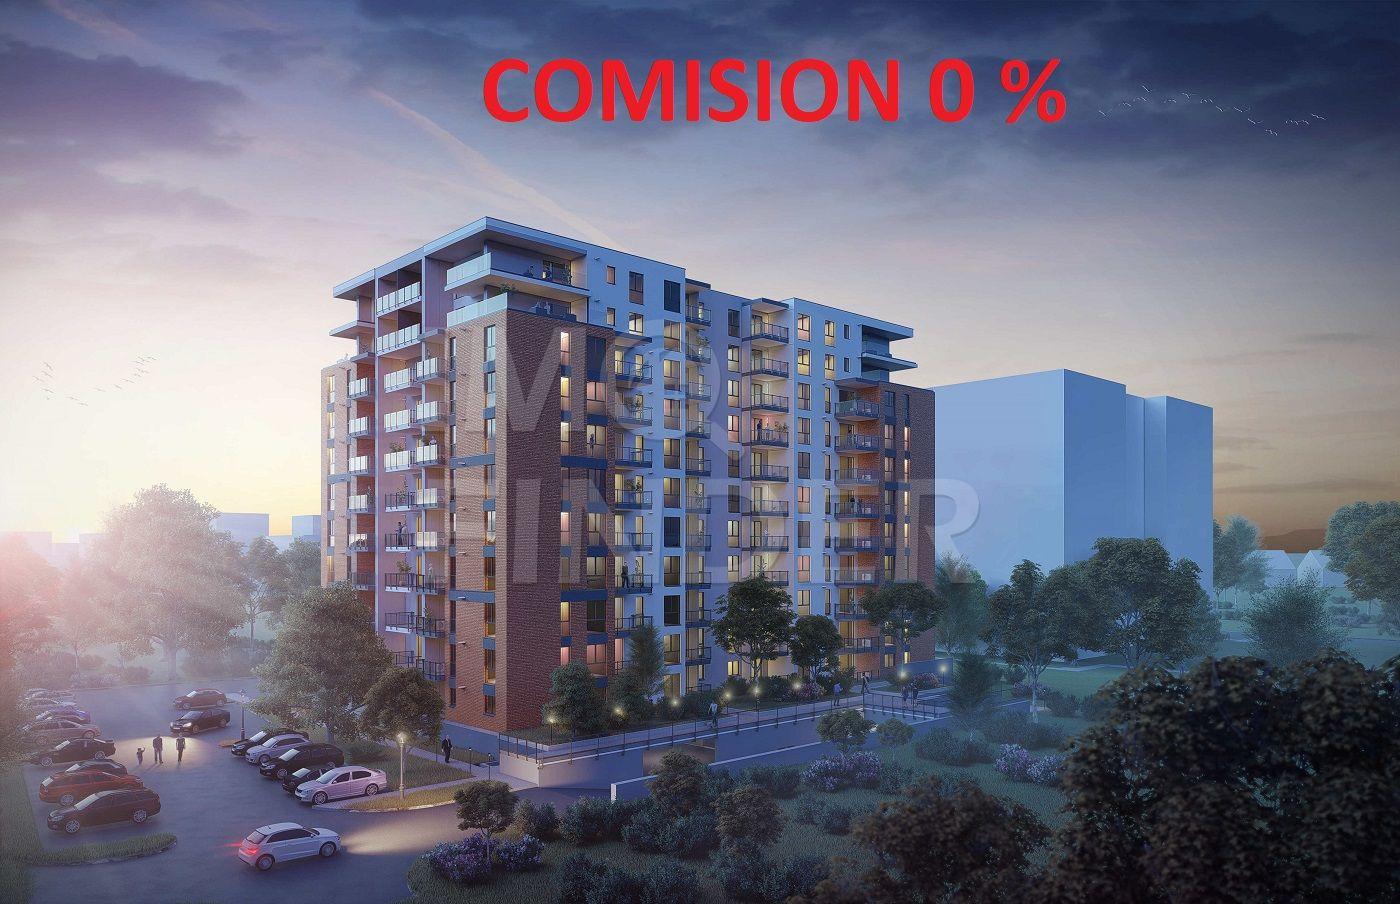 Vanzare apartamente 1,2 si 3 camere, proiect nou, cartier Buna Ziua